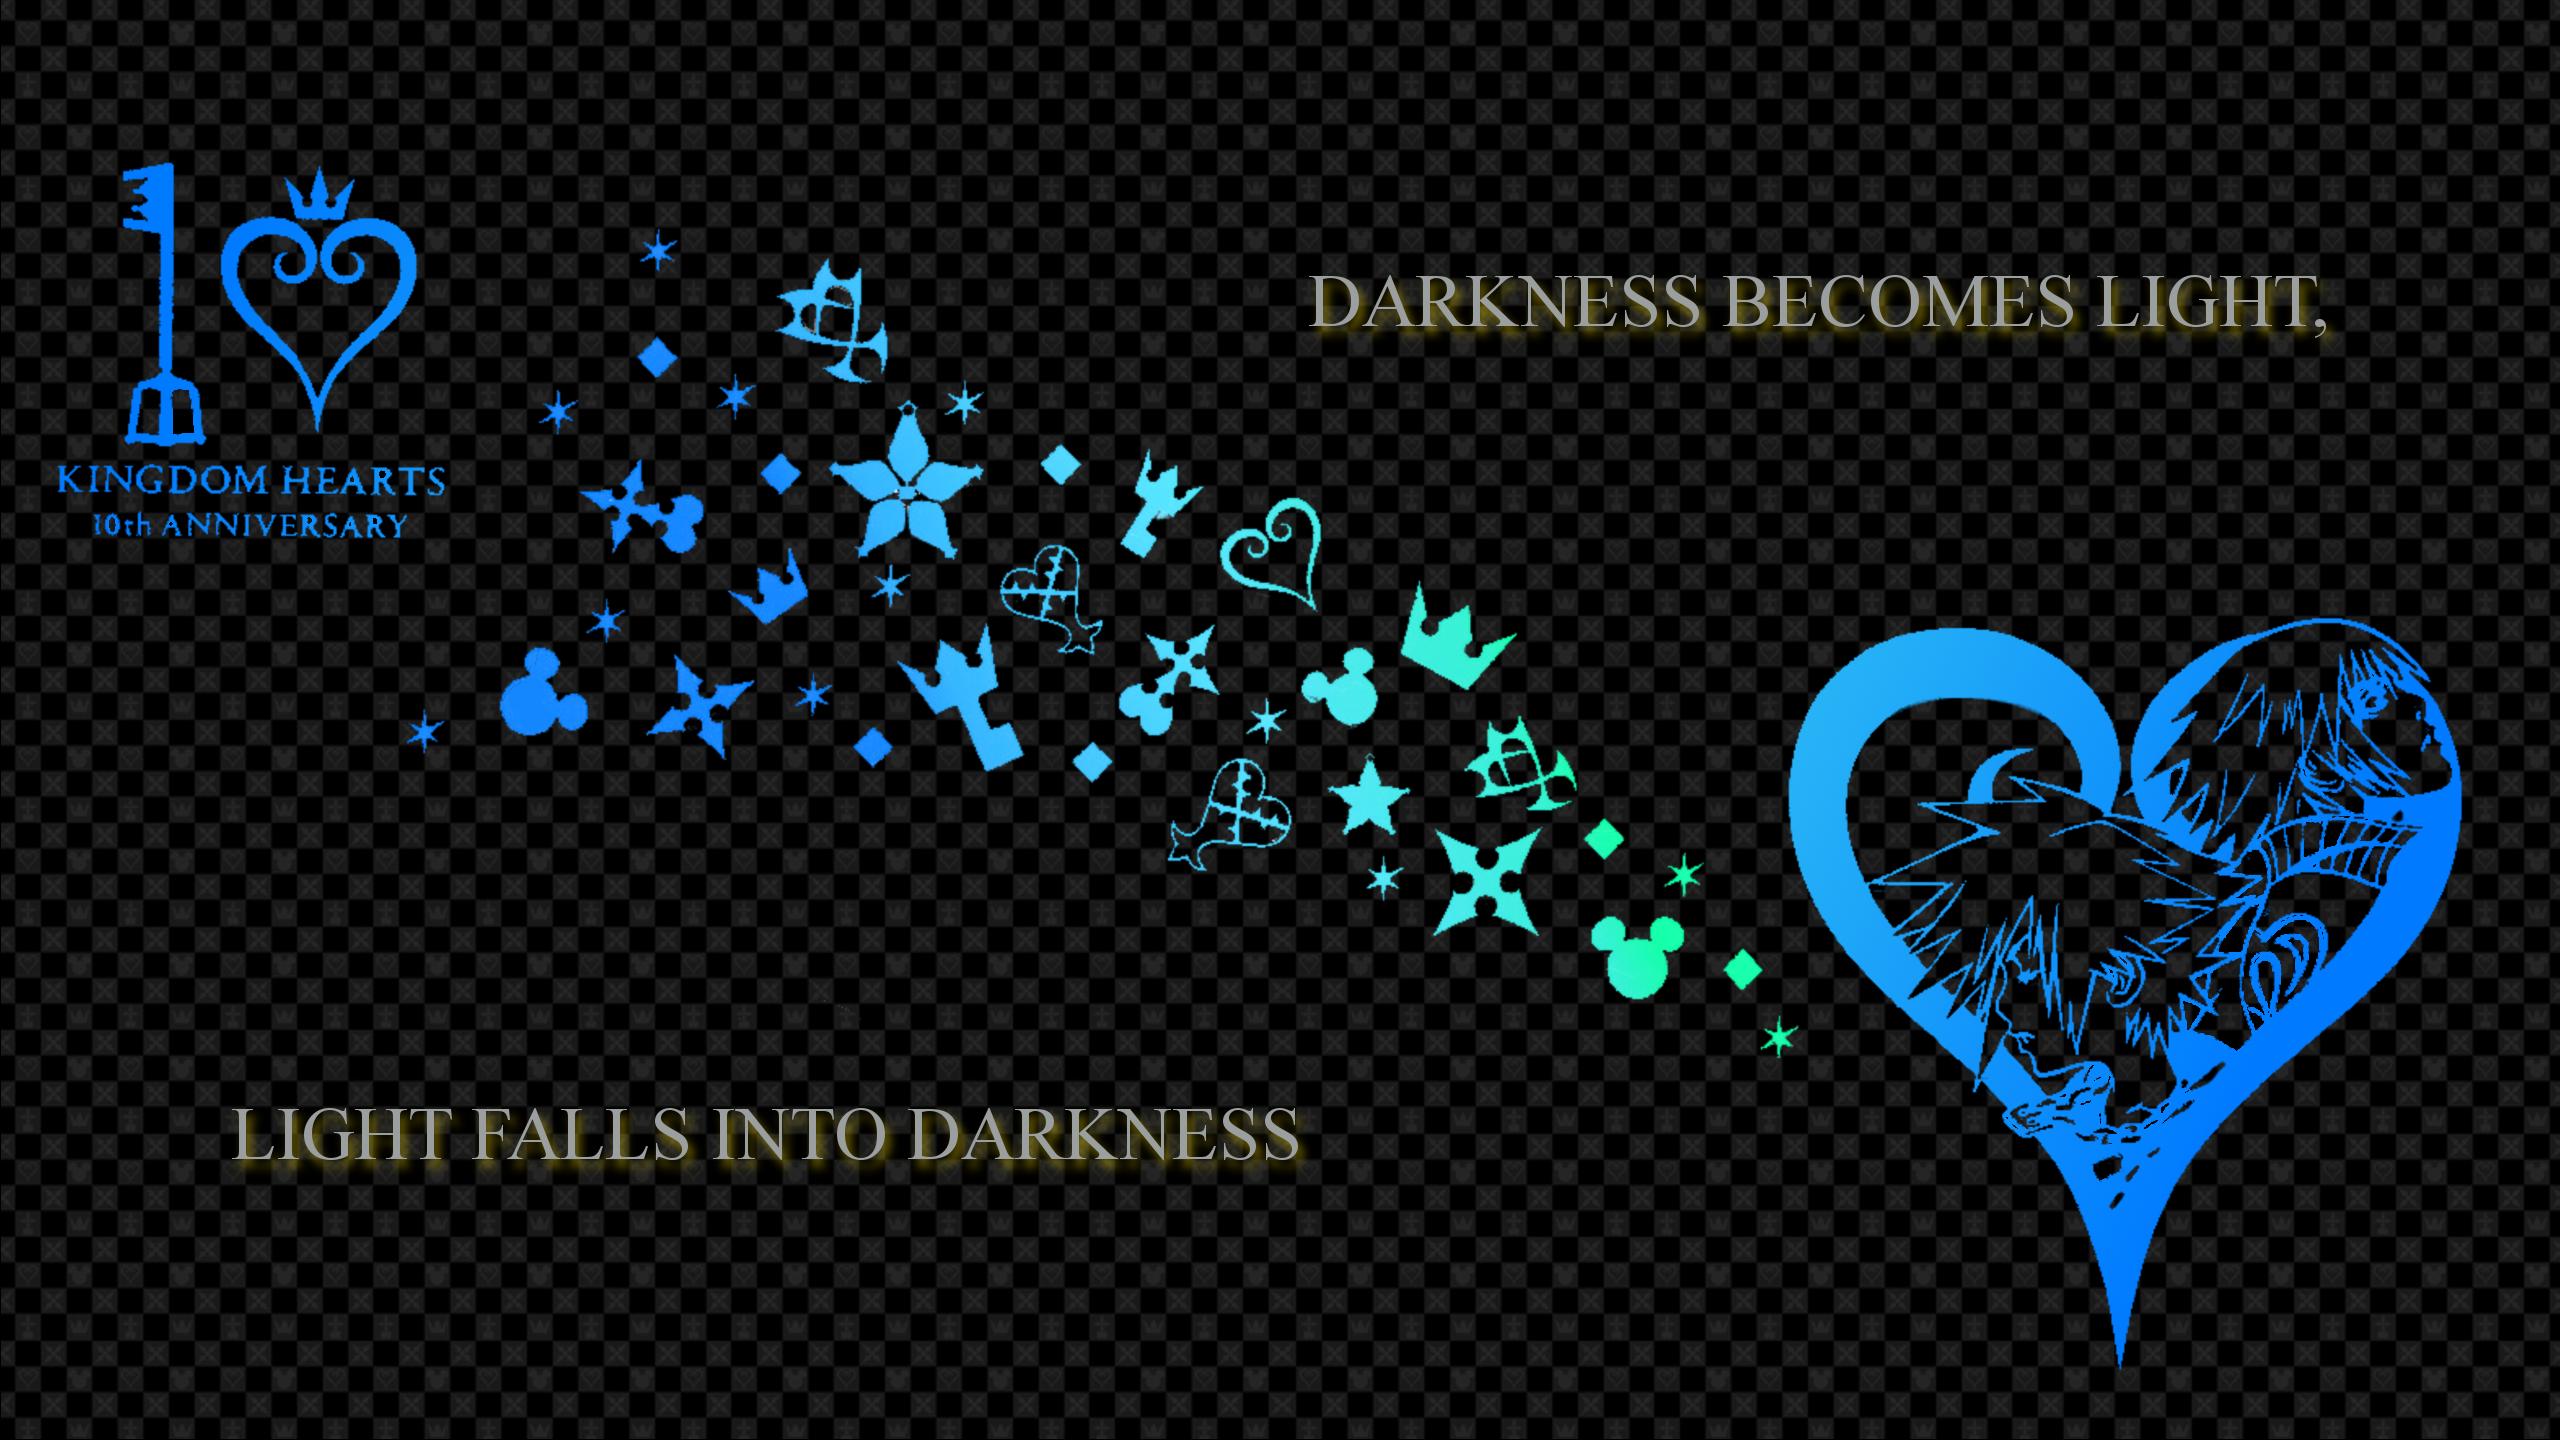 kingdom hearts wallpaper iphone